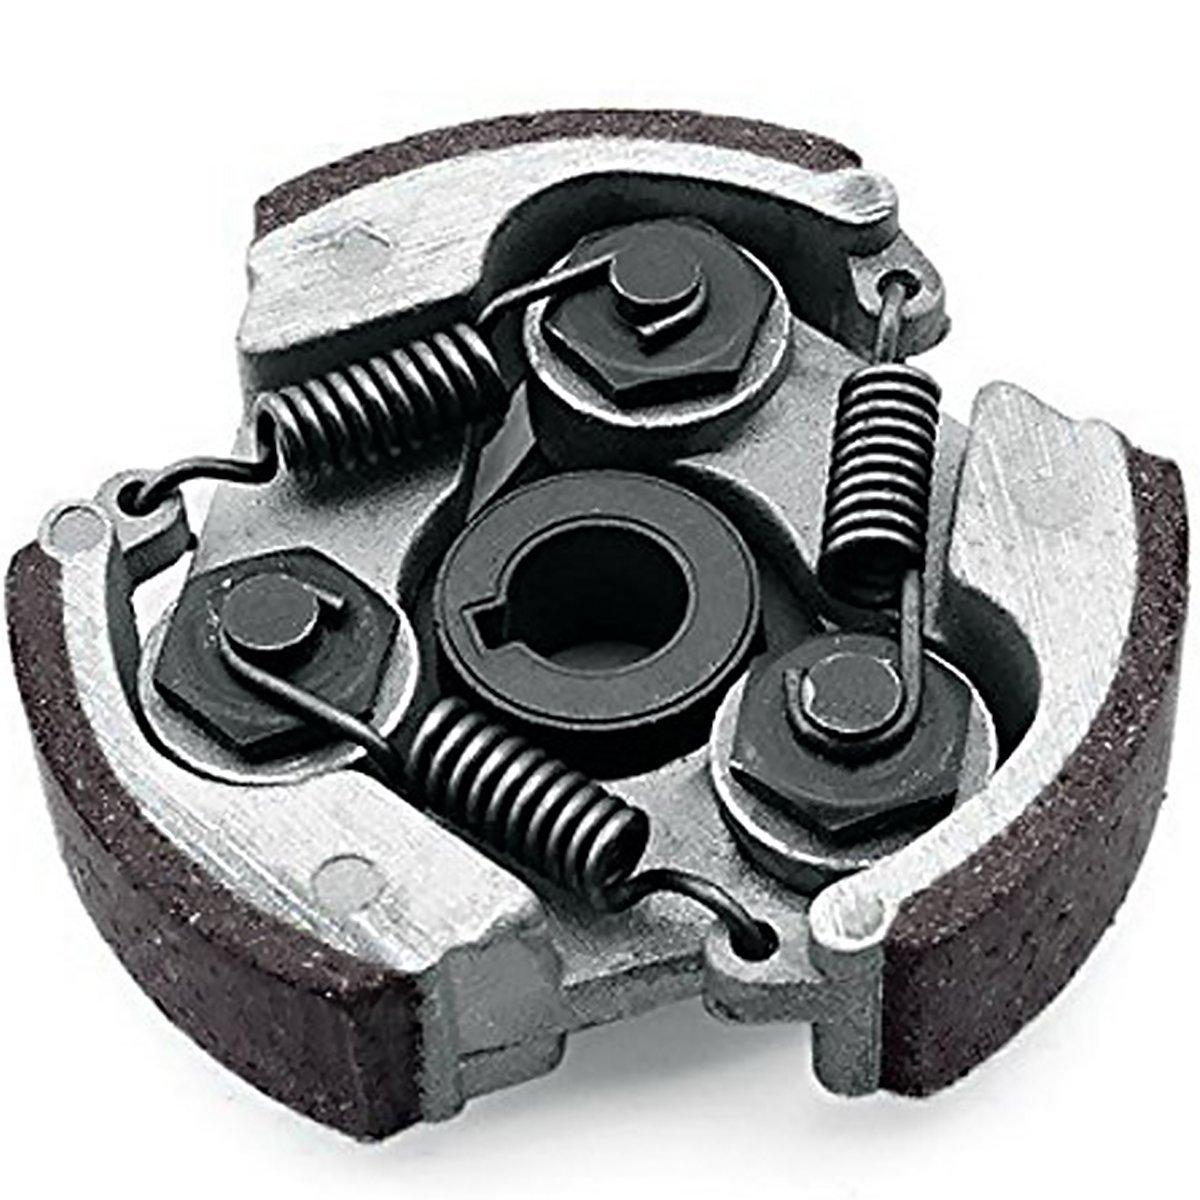 Mini Pocket Bike Clutch for 47cc 49cc Parts Cag Mta2 Mta3 by Amhousejoy DONGCHENG XINWEI